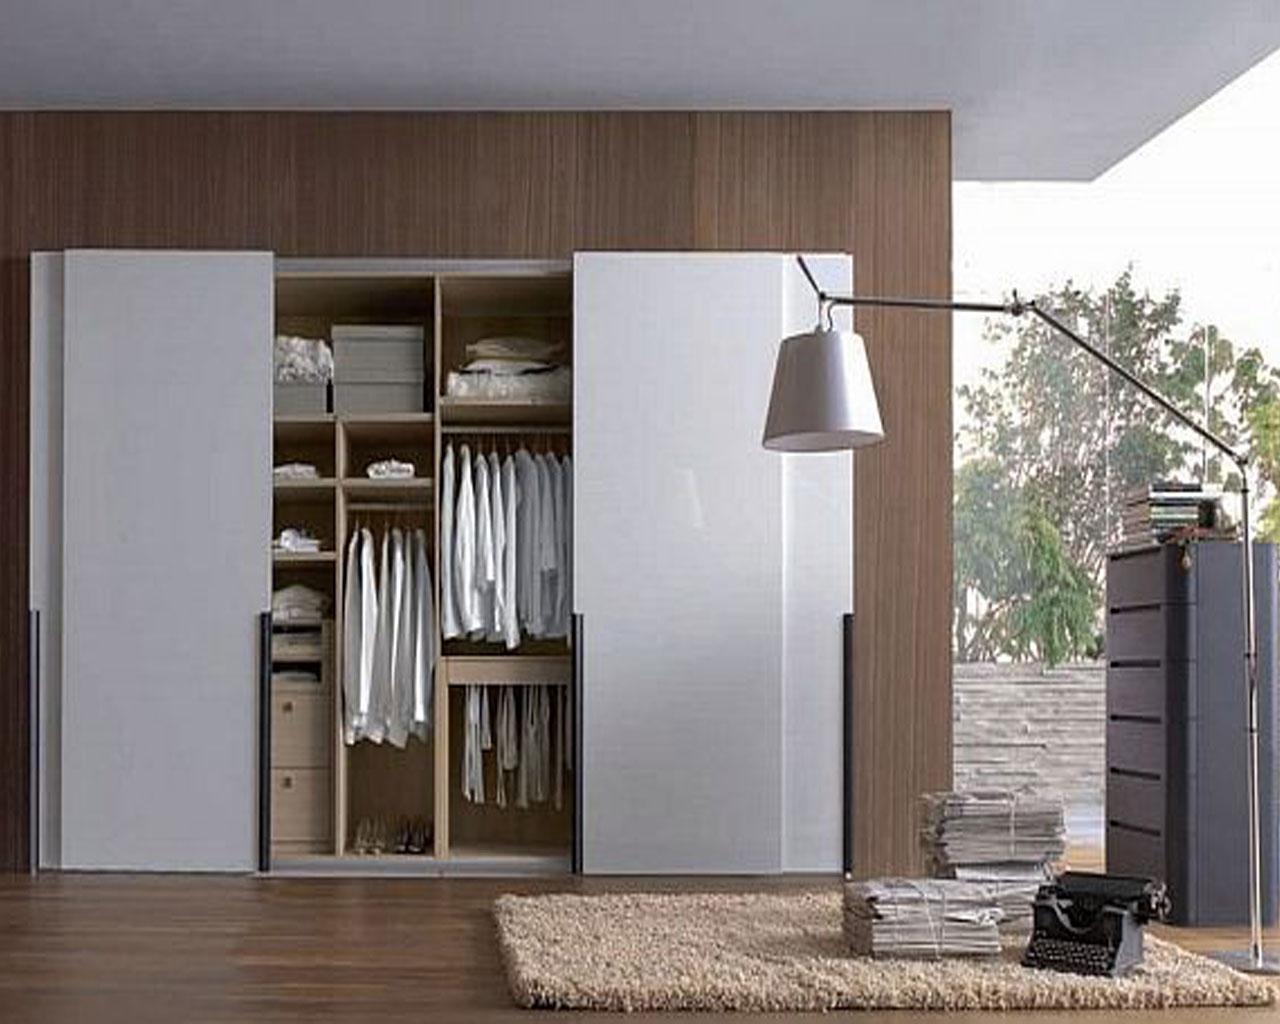 Minimalist Sliding Closet Door In White Modern Floor Lighting Fixture Small Interior Rug